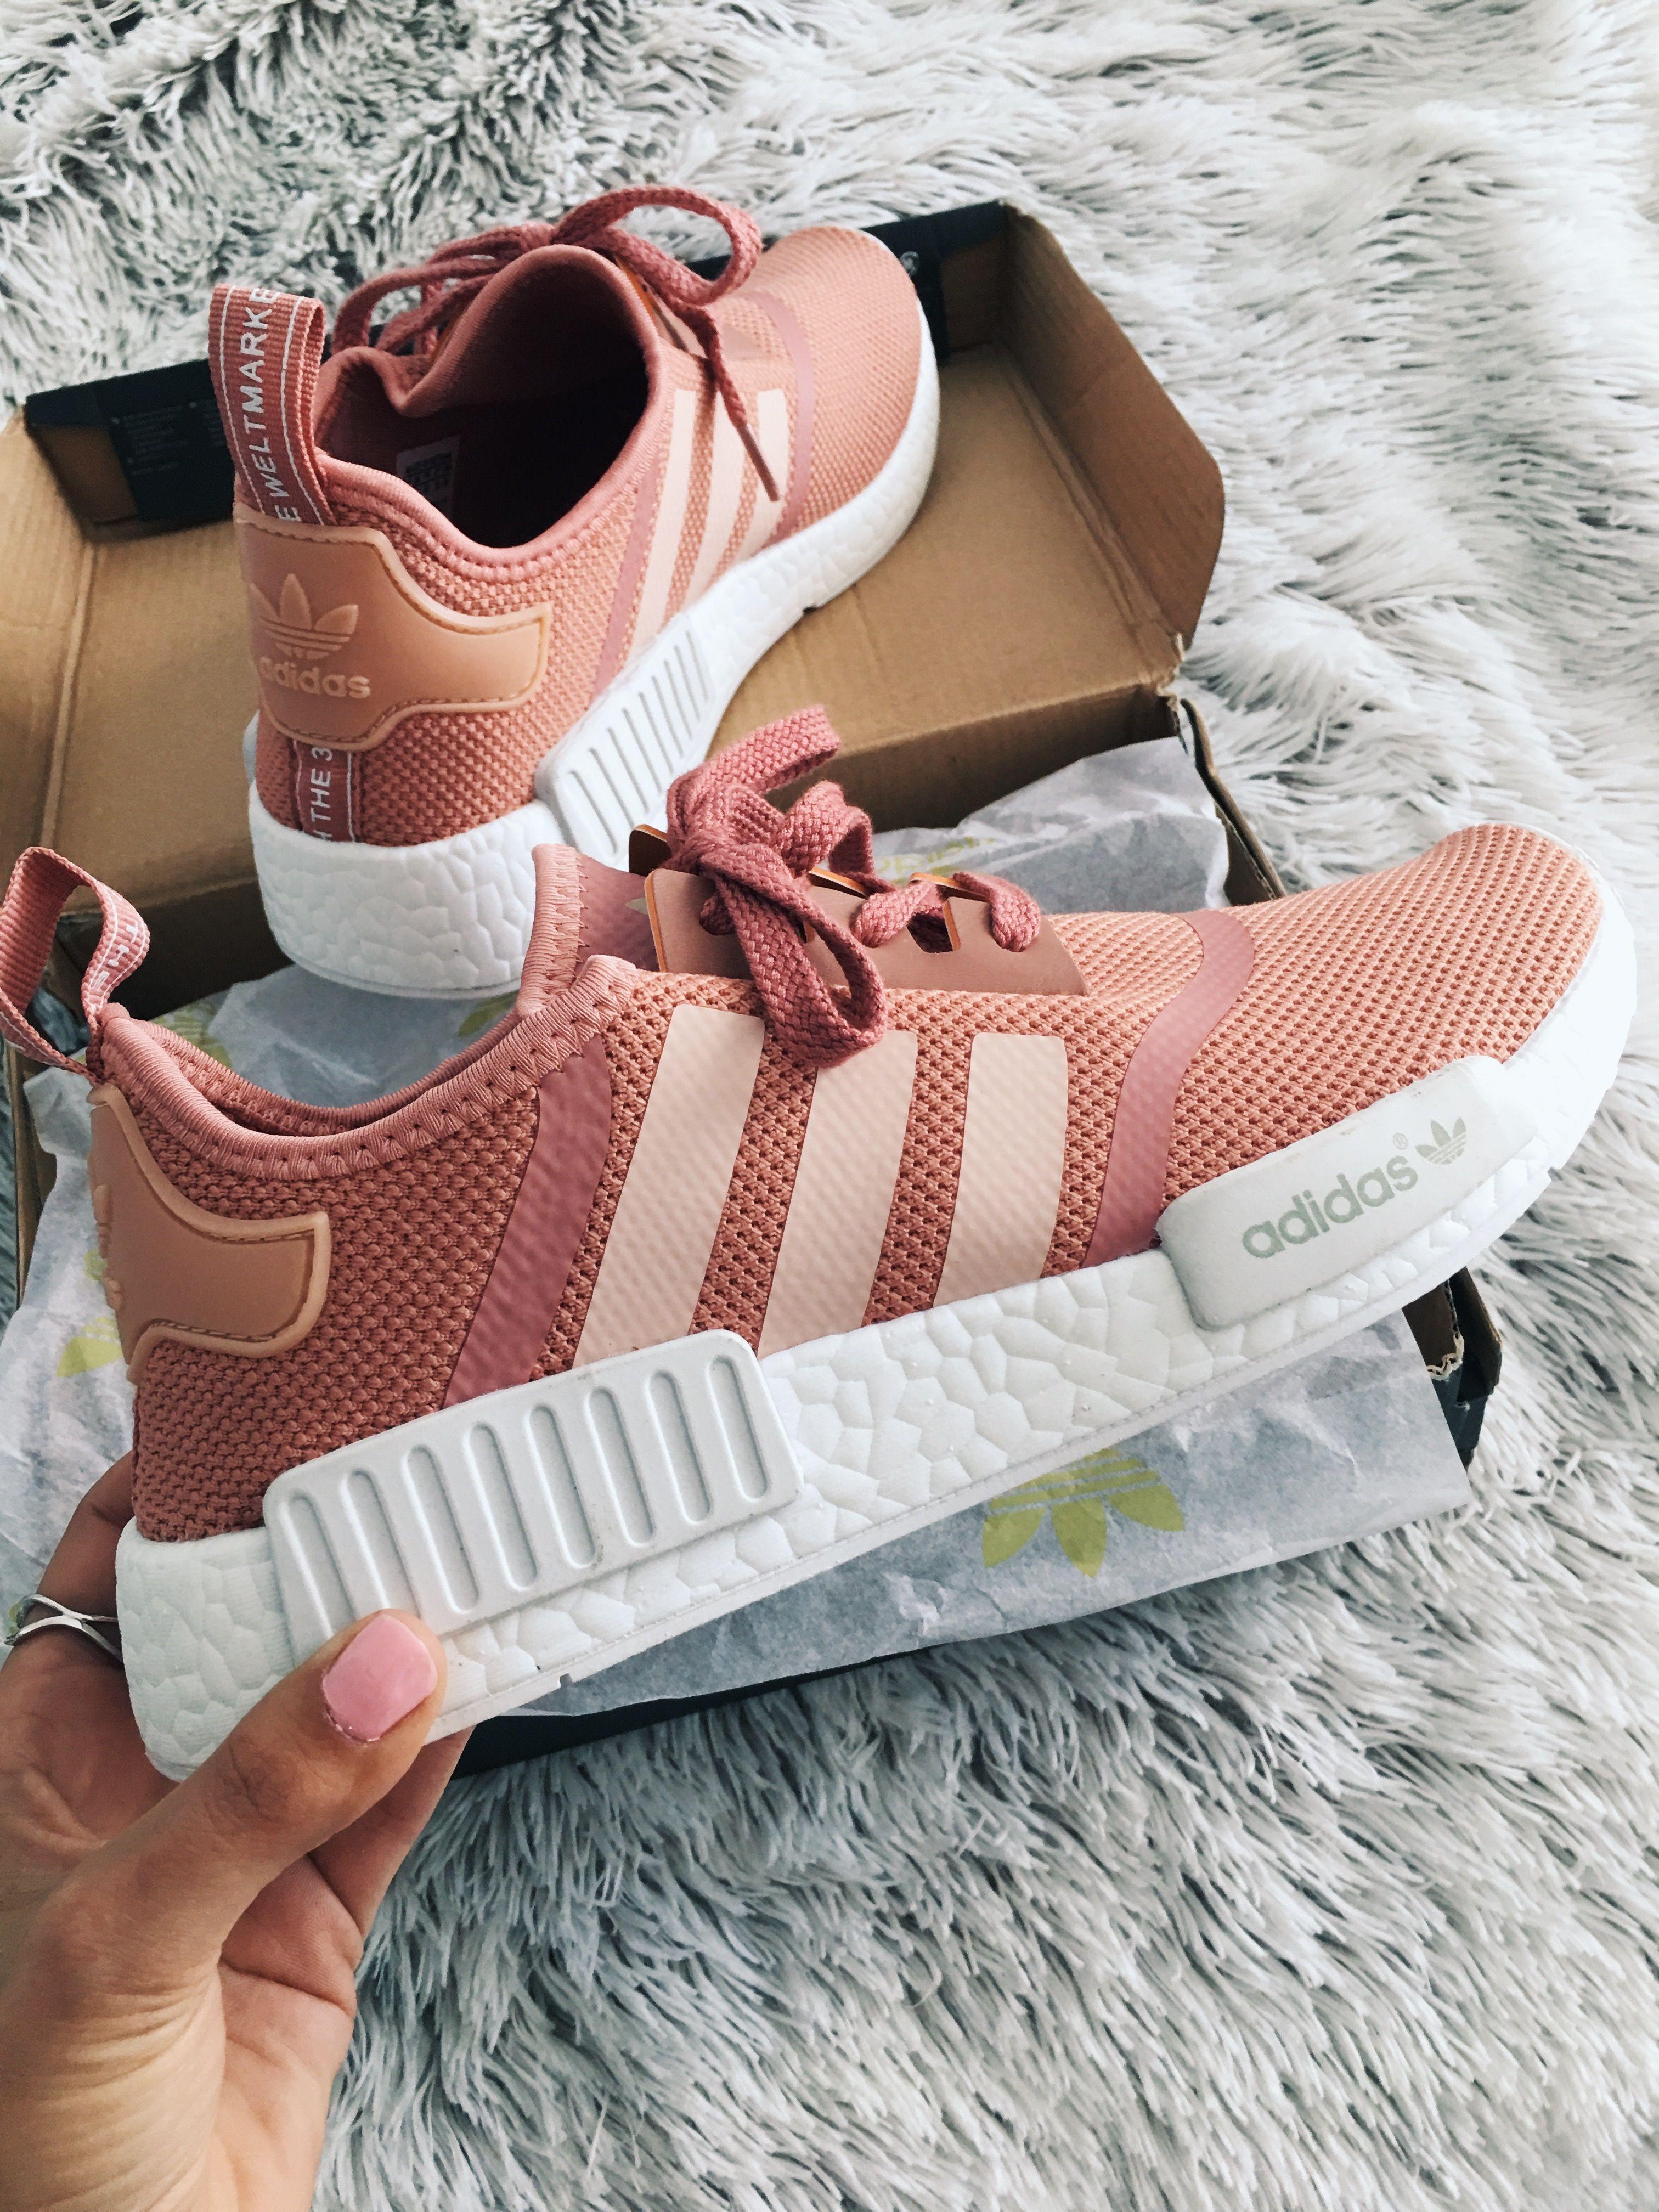 Clon adidas nmd pink (http://www.yeezyspk.com/p